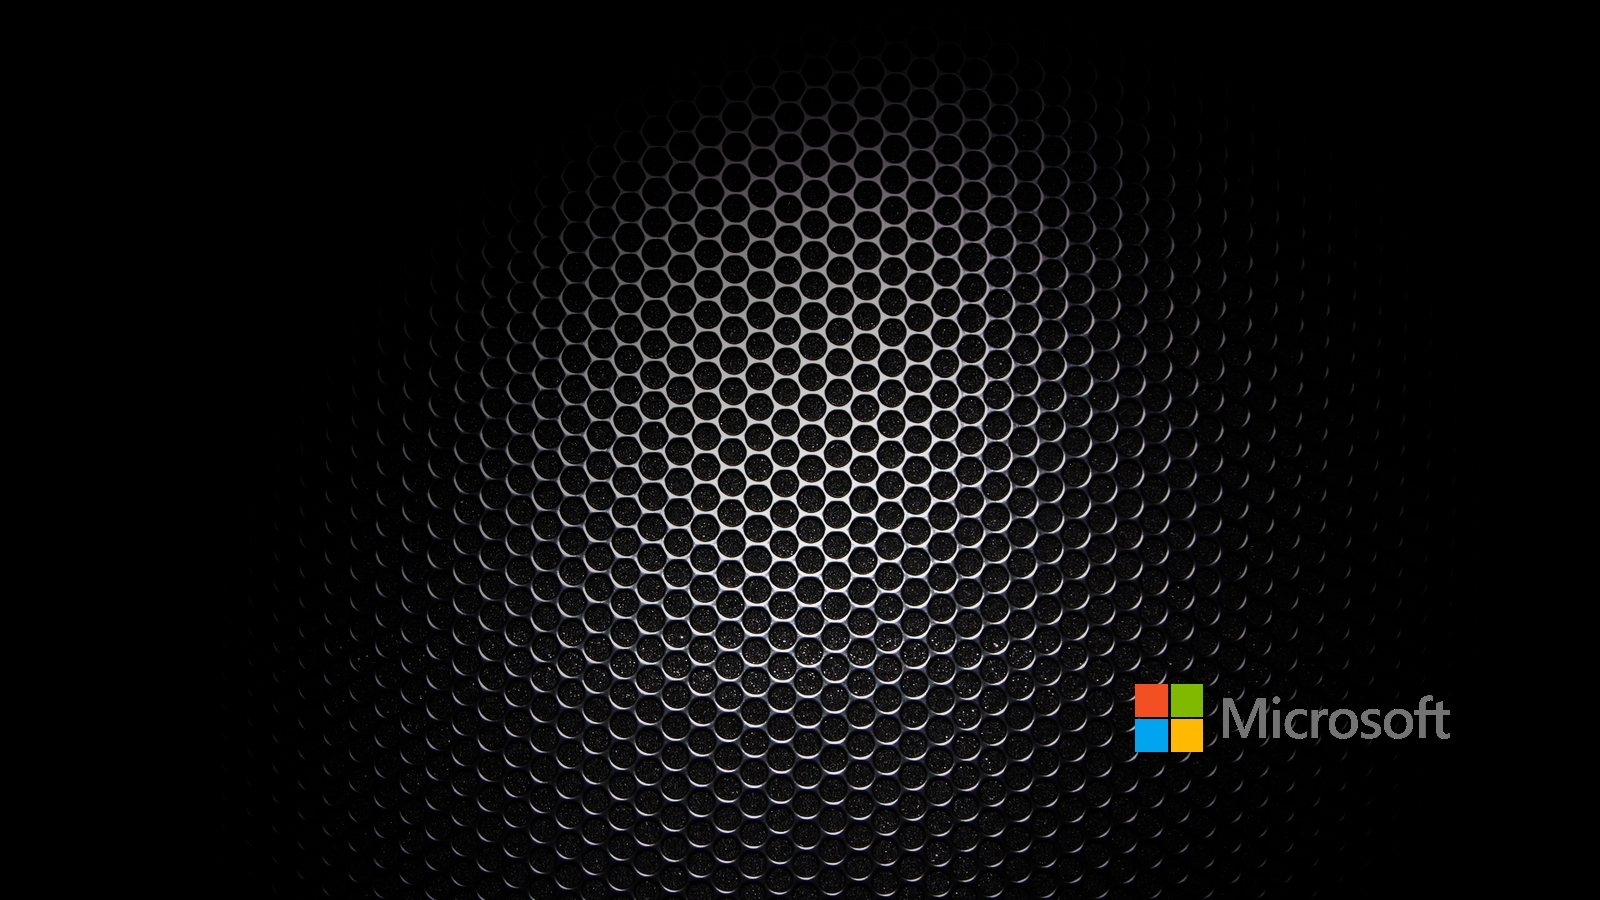 Обои Экрана Блокировки Lenovo